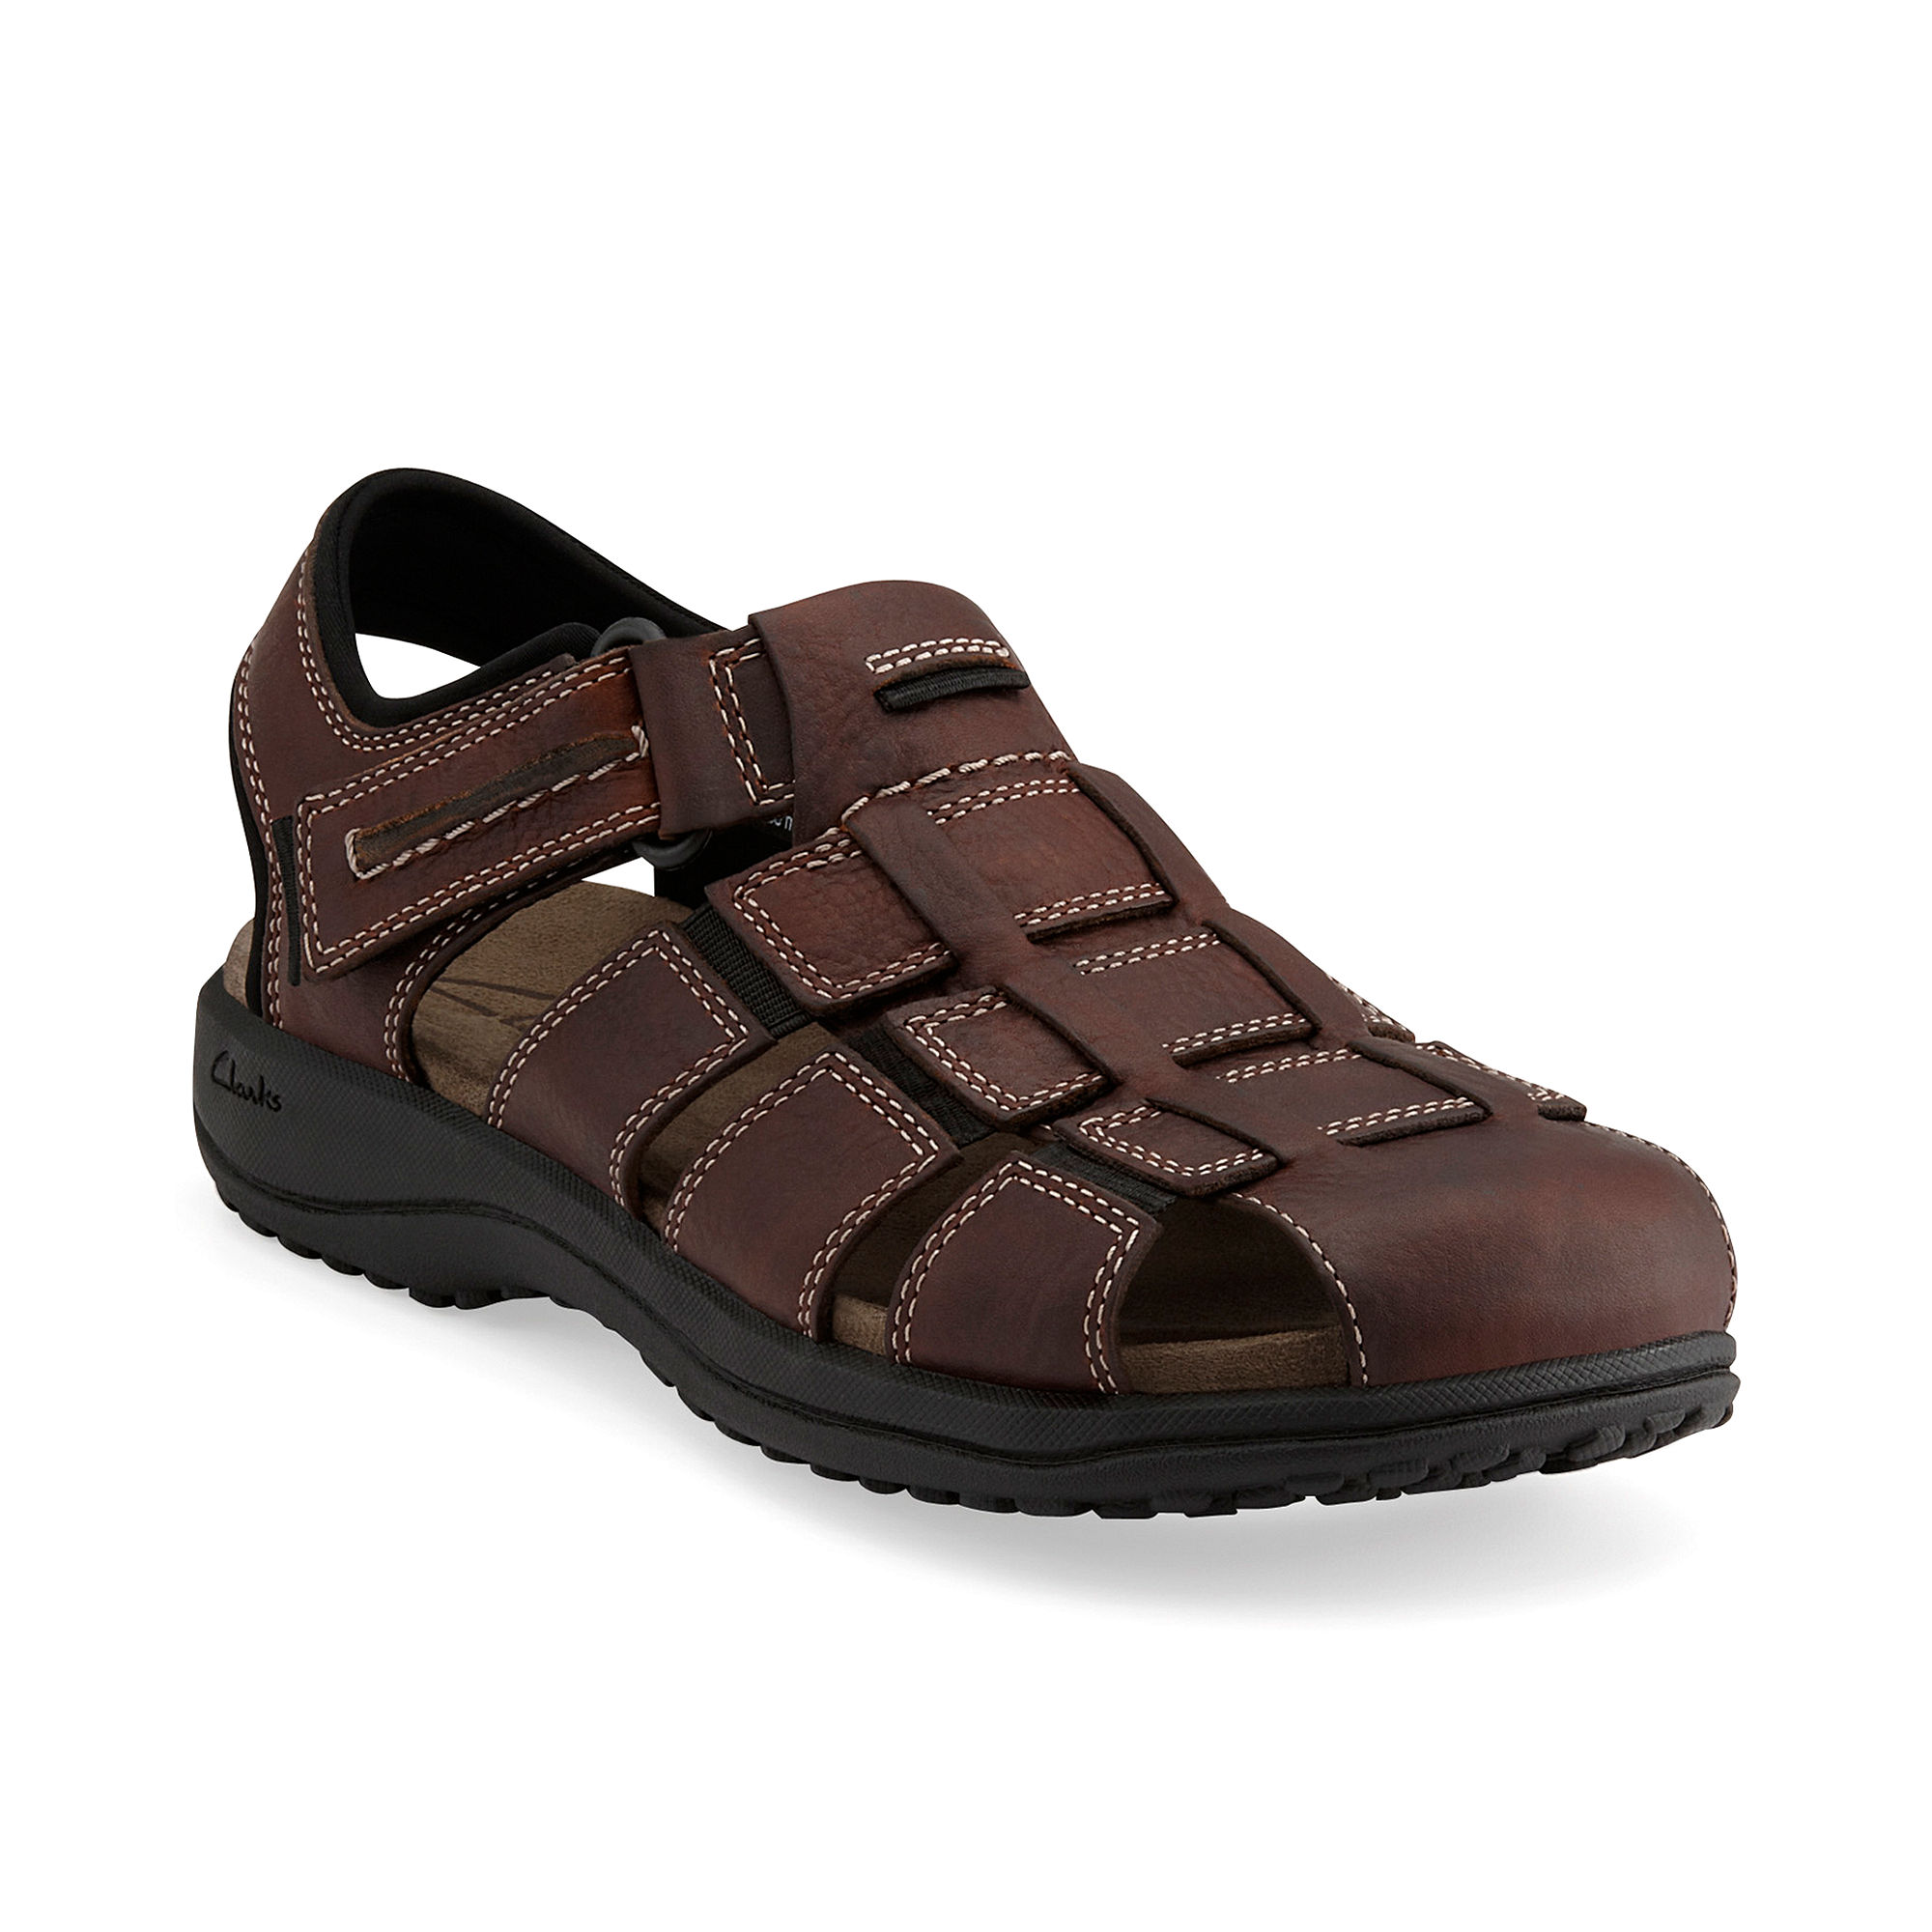 4722996037e0 Lyst - Clarks Men s Jensen Fisherman Sandals in Brown for Men